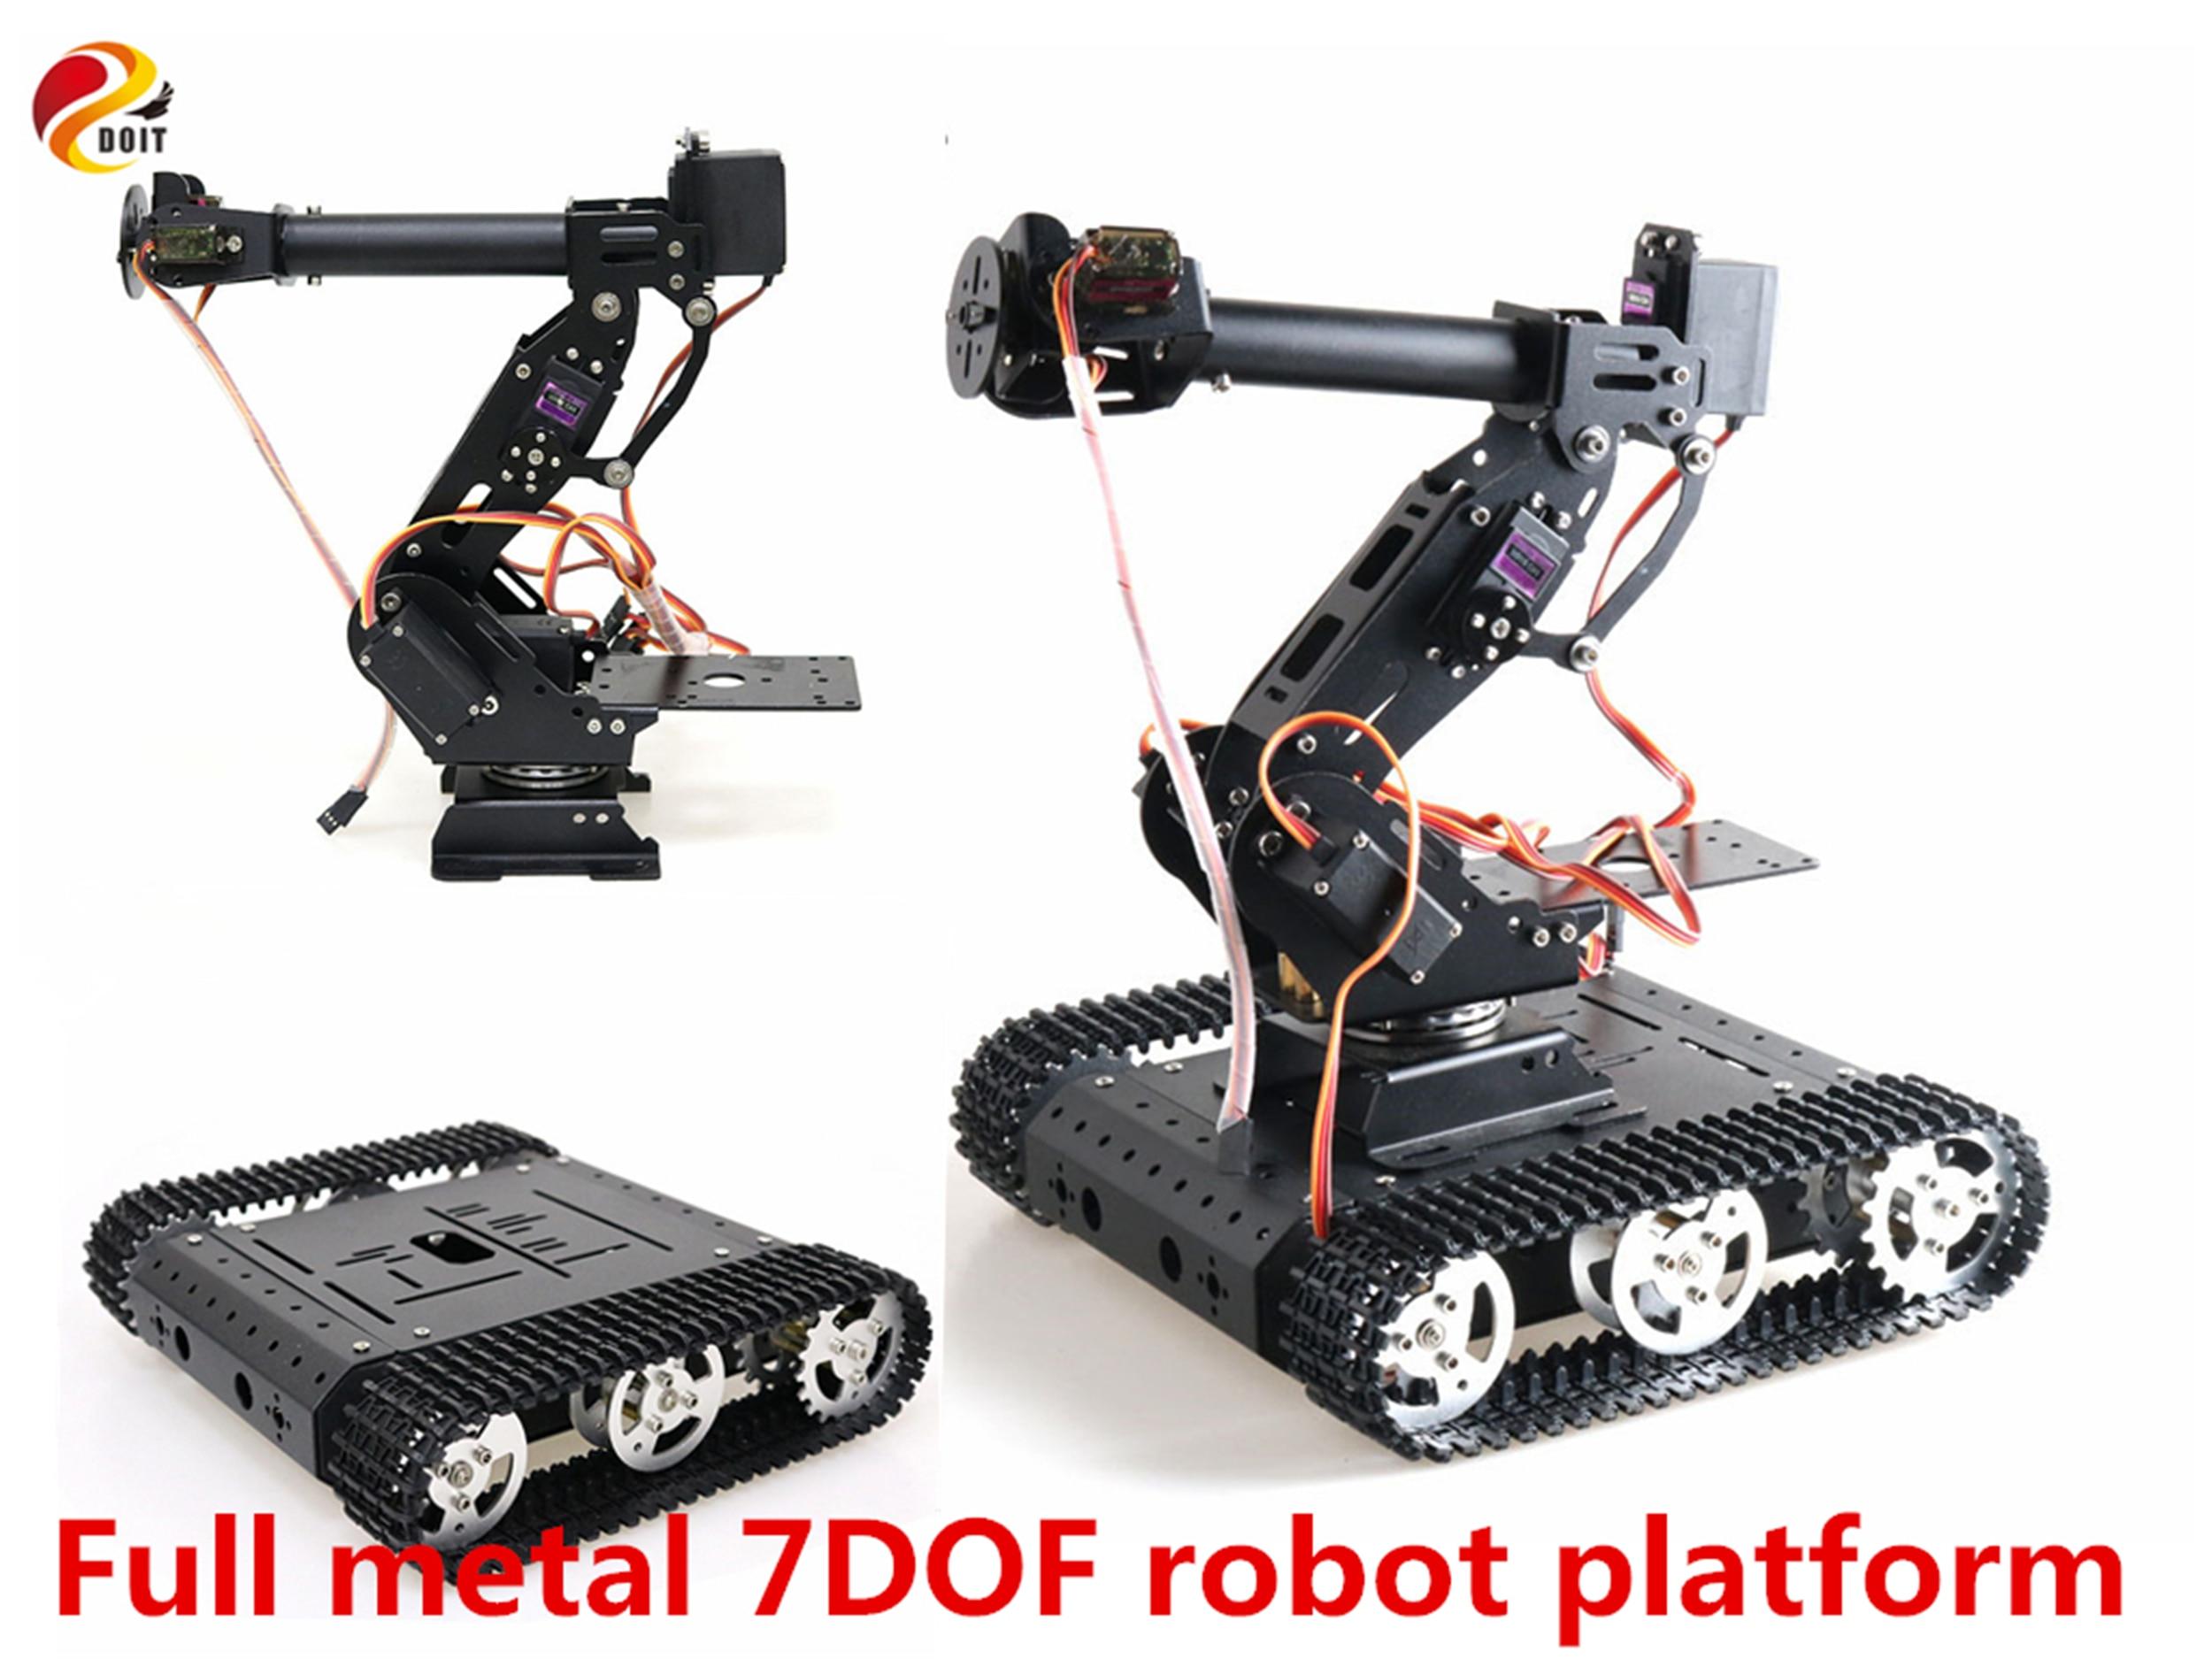 SZDOIT Full Metal Mobile 7DOF Vehicle Robotic Platform 7-axis Robot Arm + TC100 Tank Chassis Kit Servos Motors DIY for Arduino